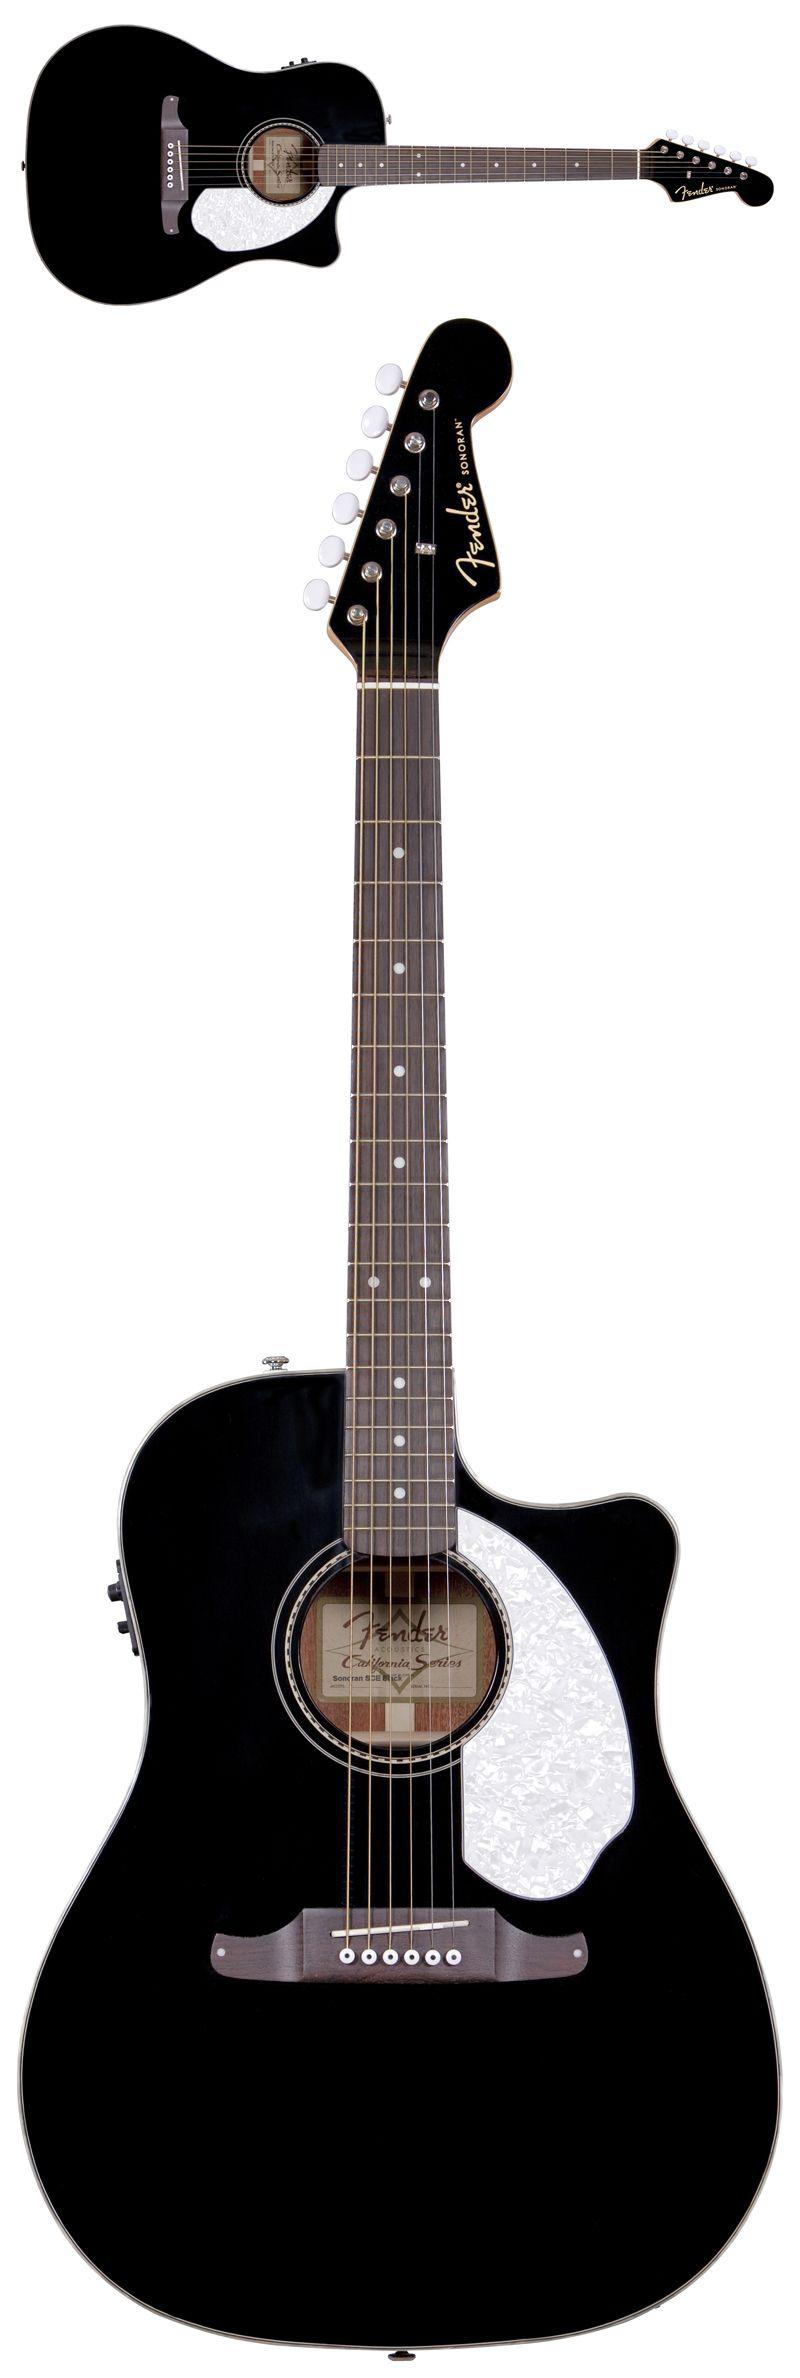 fender sonoran sce acoustic electric guitar black gently weeps guitar fender acoustic. Black Bedroom Furniture Sets. Home Design Ideas